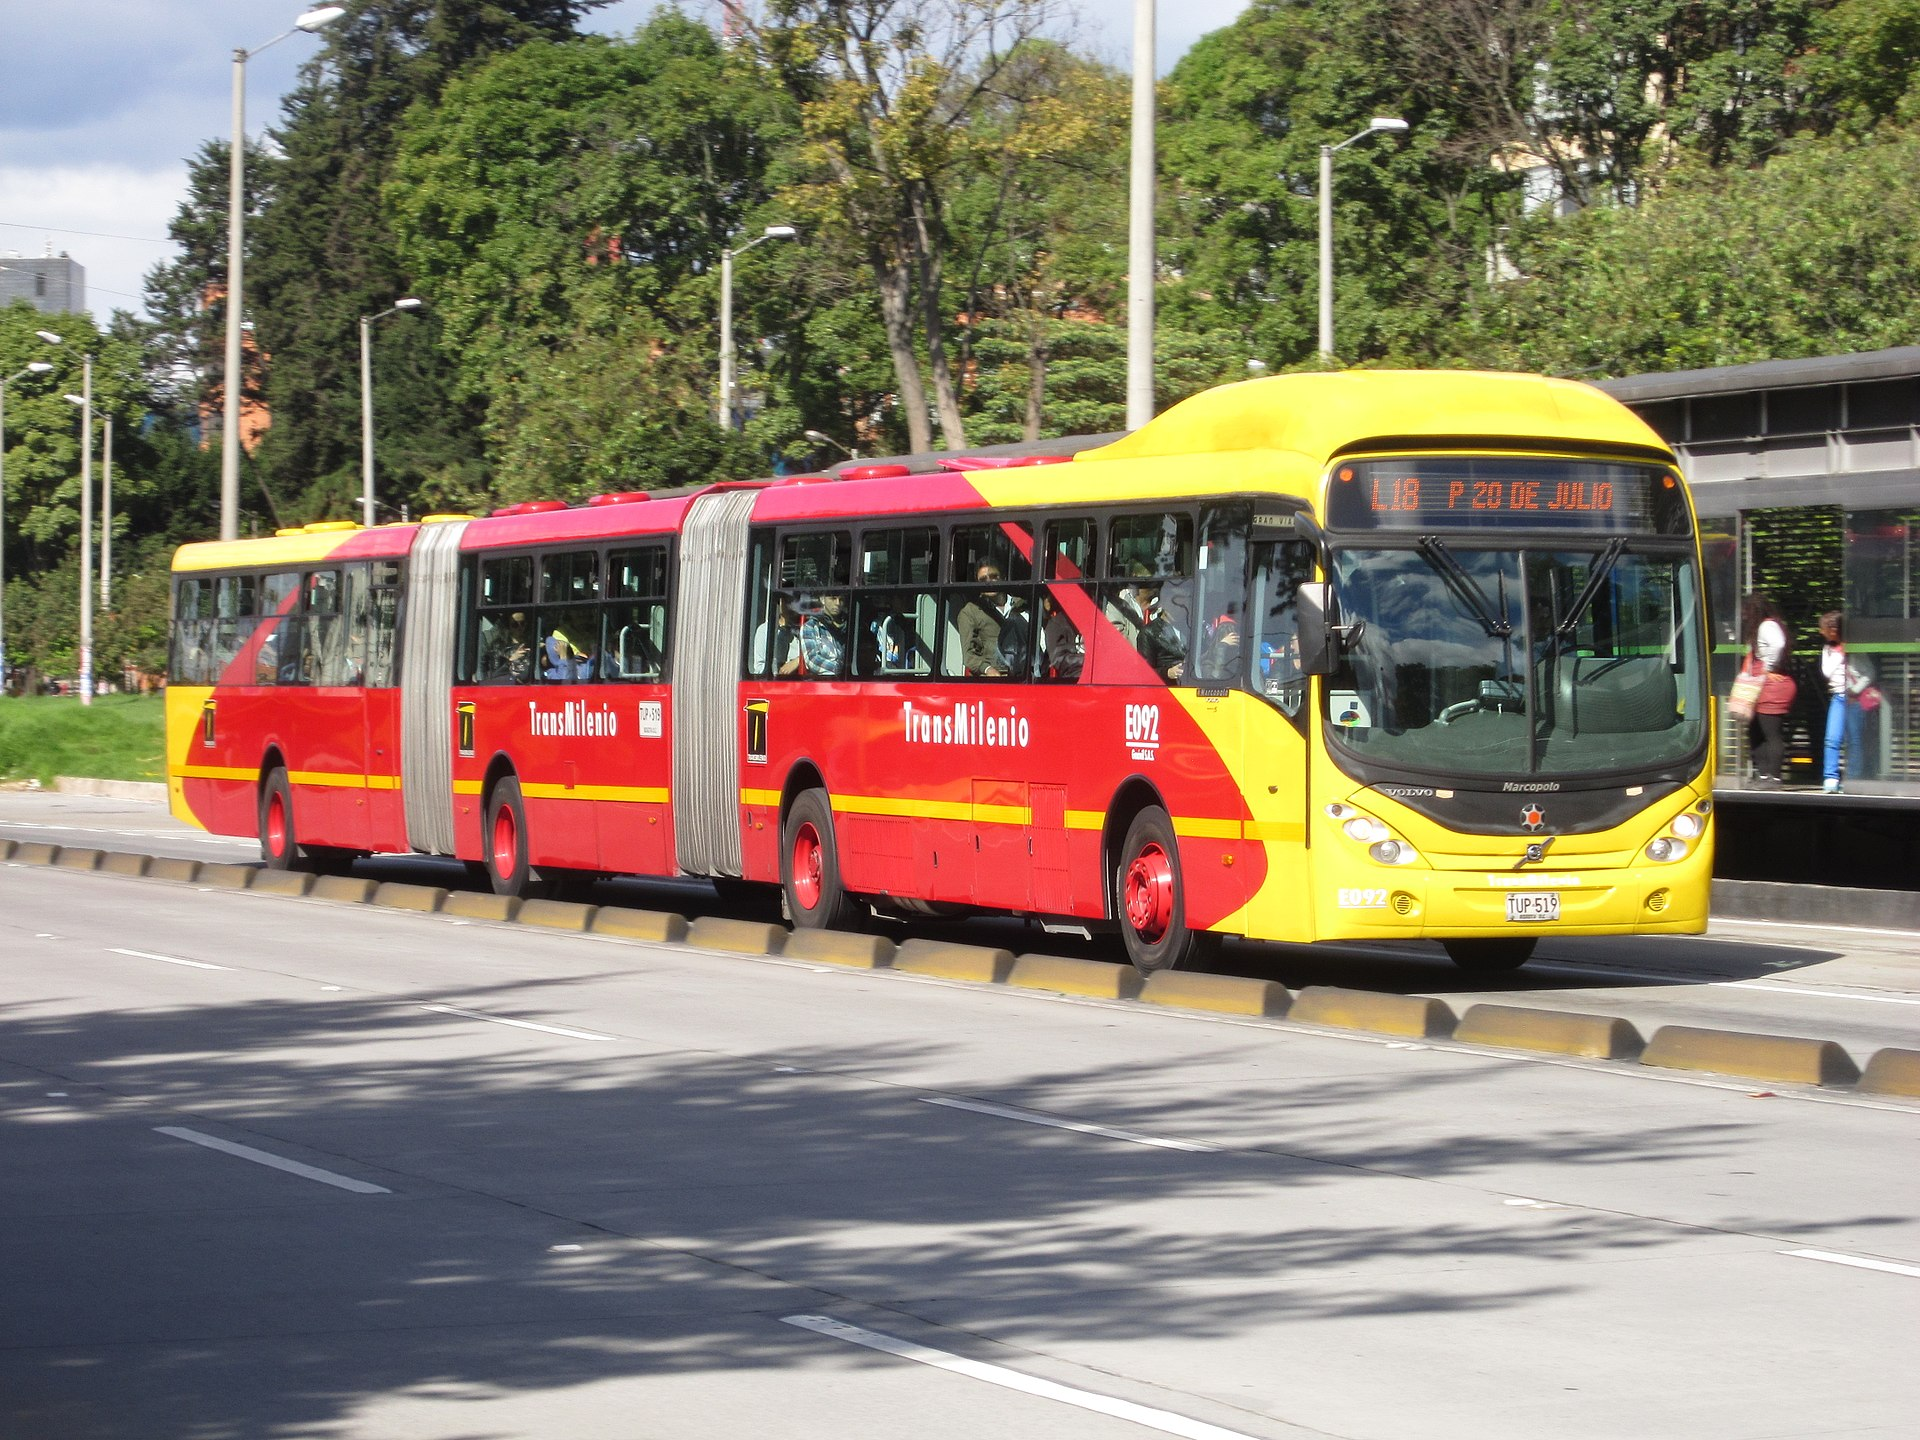 Autobús - Wikipedia, la enciclopedia libre